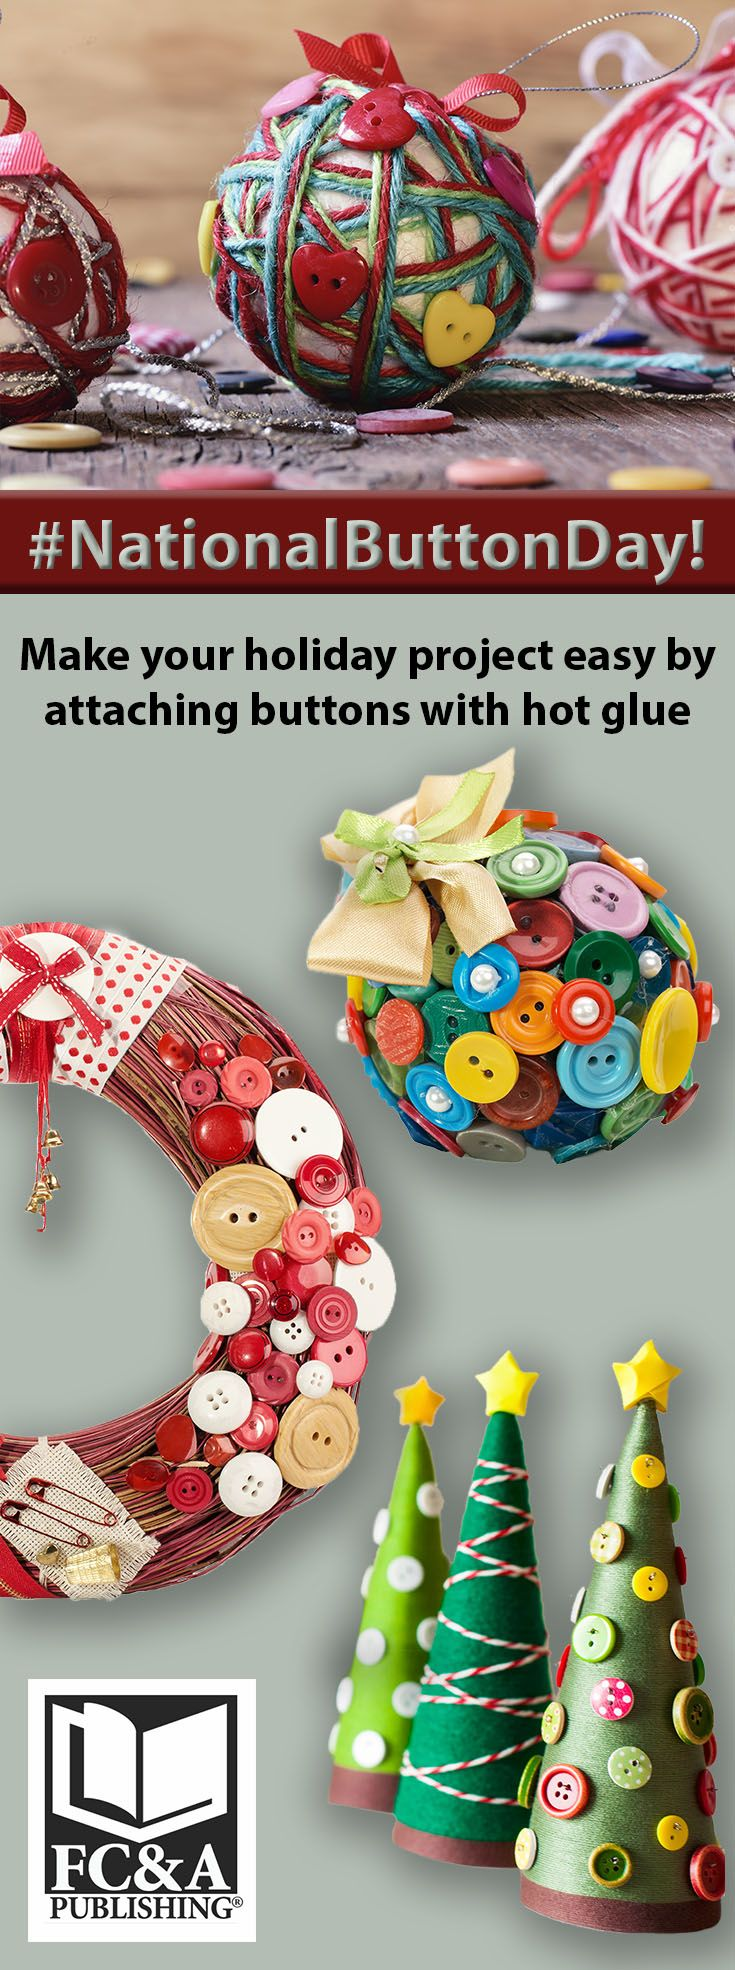 NationalButtonDay, Creative Holiday Button Ideas